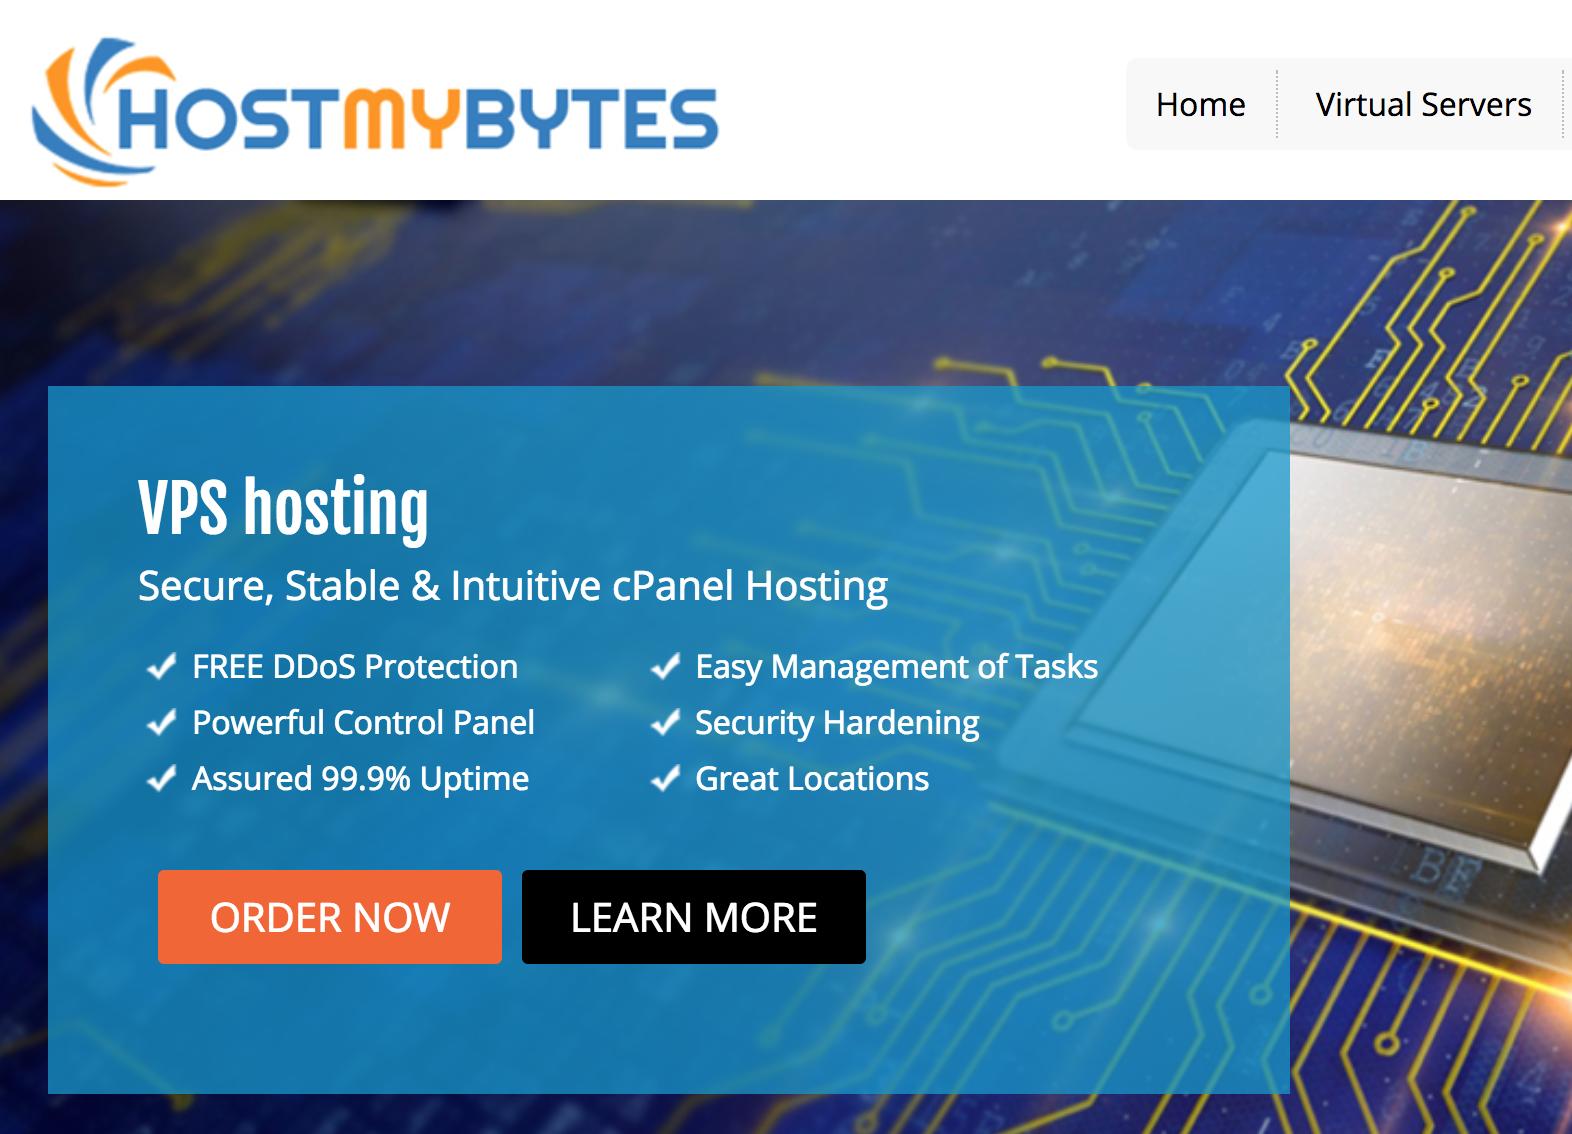 HostMyBytes年付10美元便宜VPS-支持支付宝VPS-支持更换iP-洛杉矶VPS提供亚洲优化线路并且提供DDoS保护